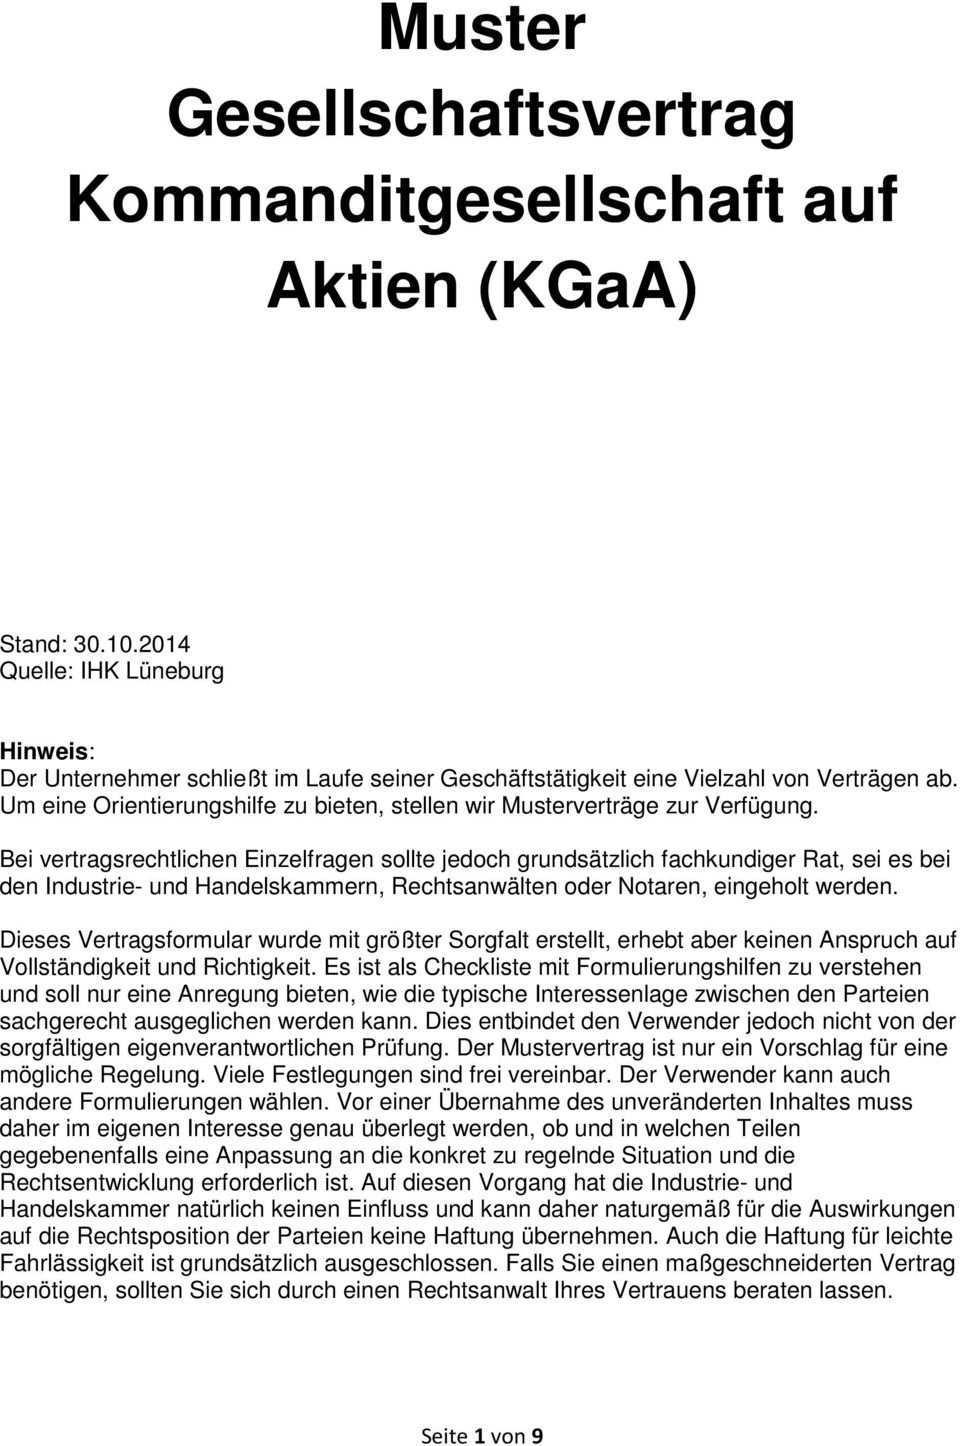 Muster Gesellschaftsvertrag Kommanditgesellschaft Auf Aktien Kgaa Pdf Free Download